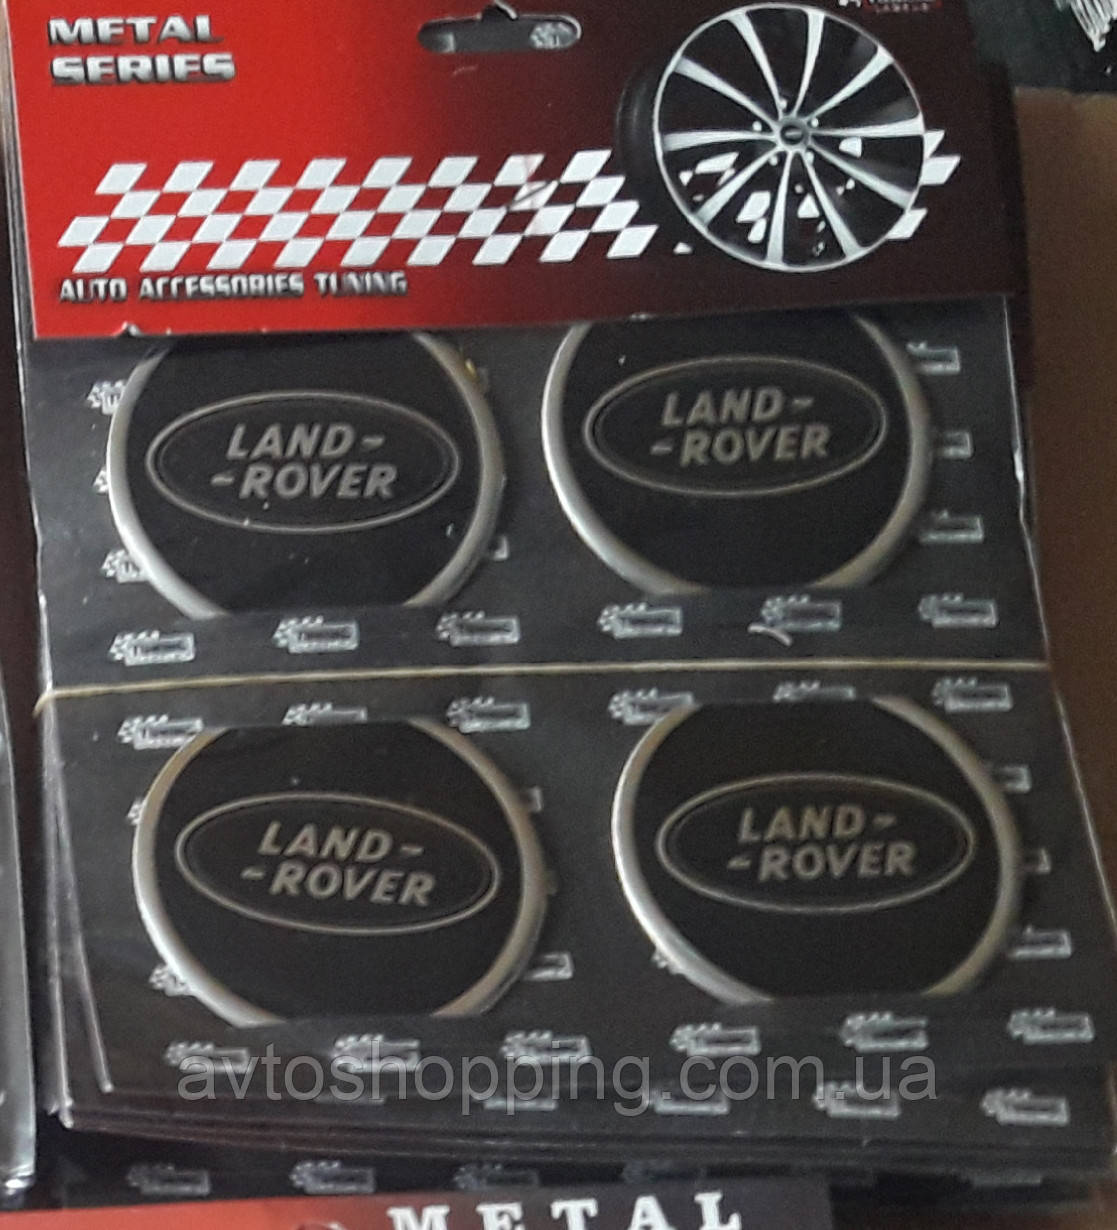 Наклейки на колпачки, заглушки, наклейки на диски 60 мм Land Rover (Ленд Ровер) - Avto Shopping в Днепре